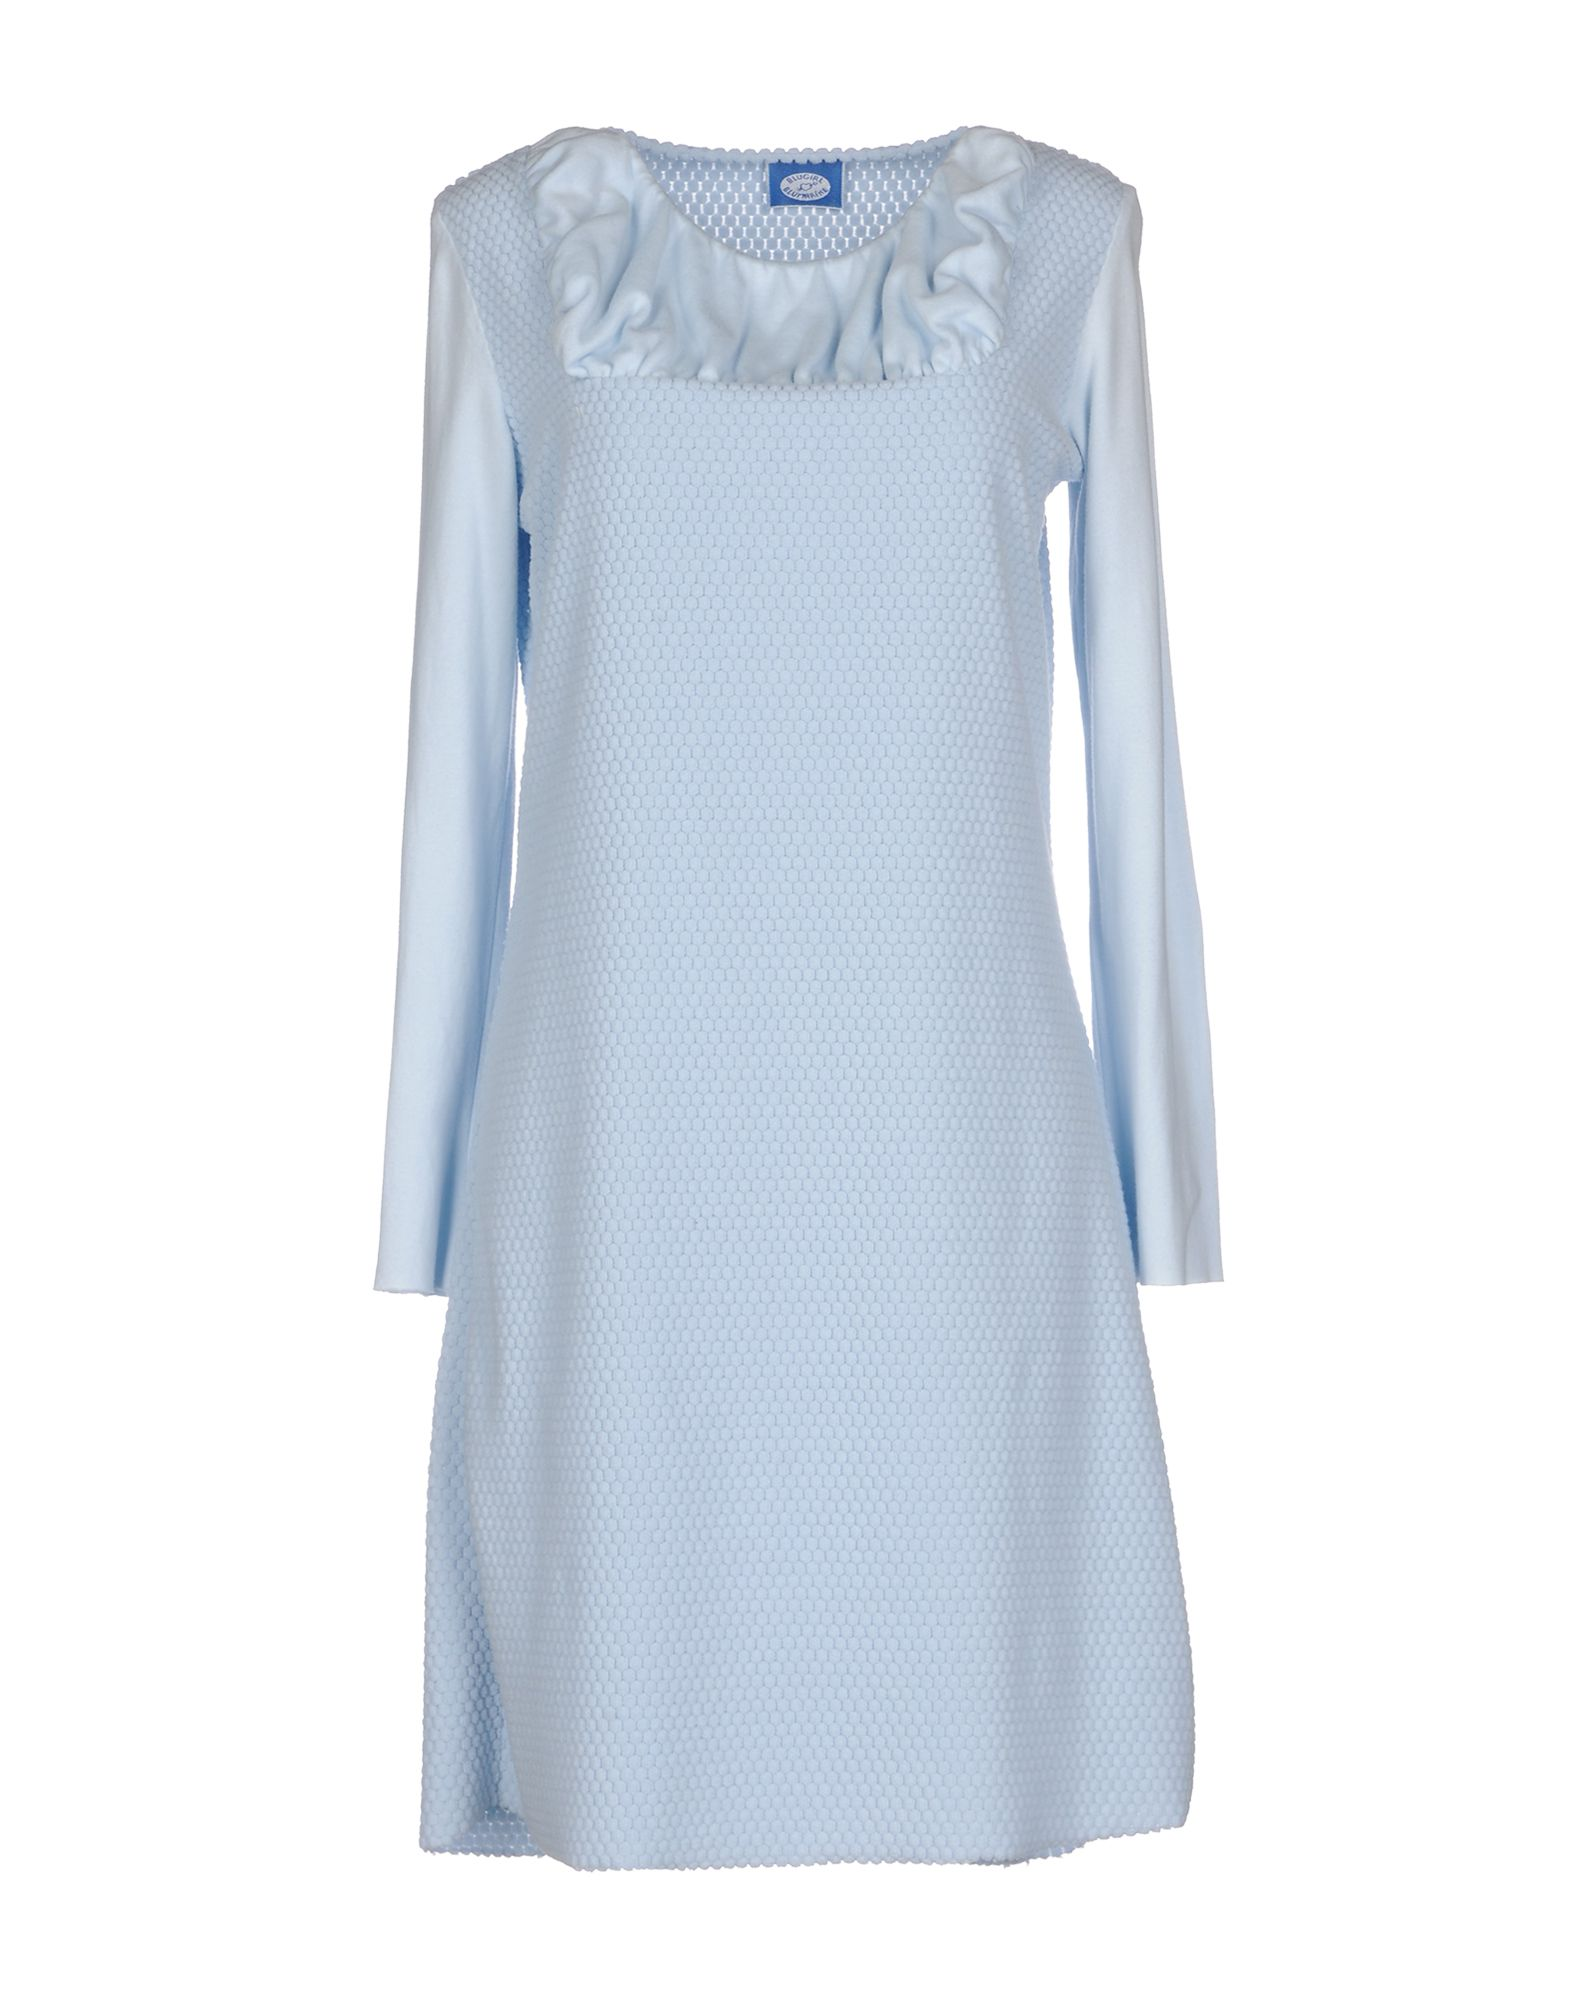 Vestito Corto Blugirl Blumarine Donna - Acquista online su iCvBQkTY